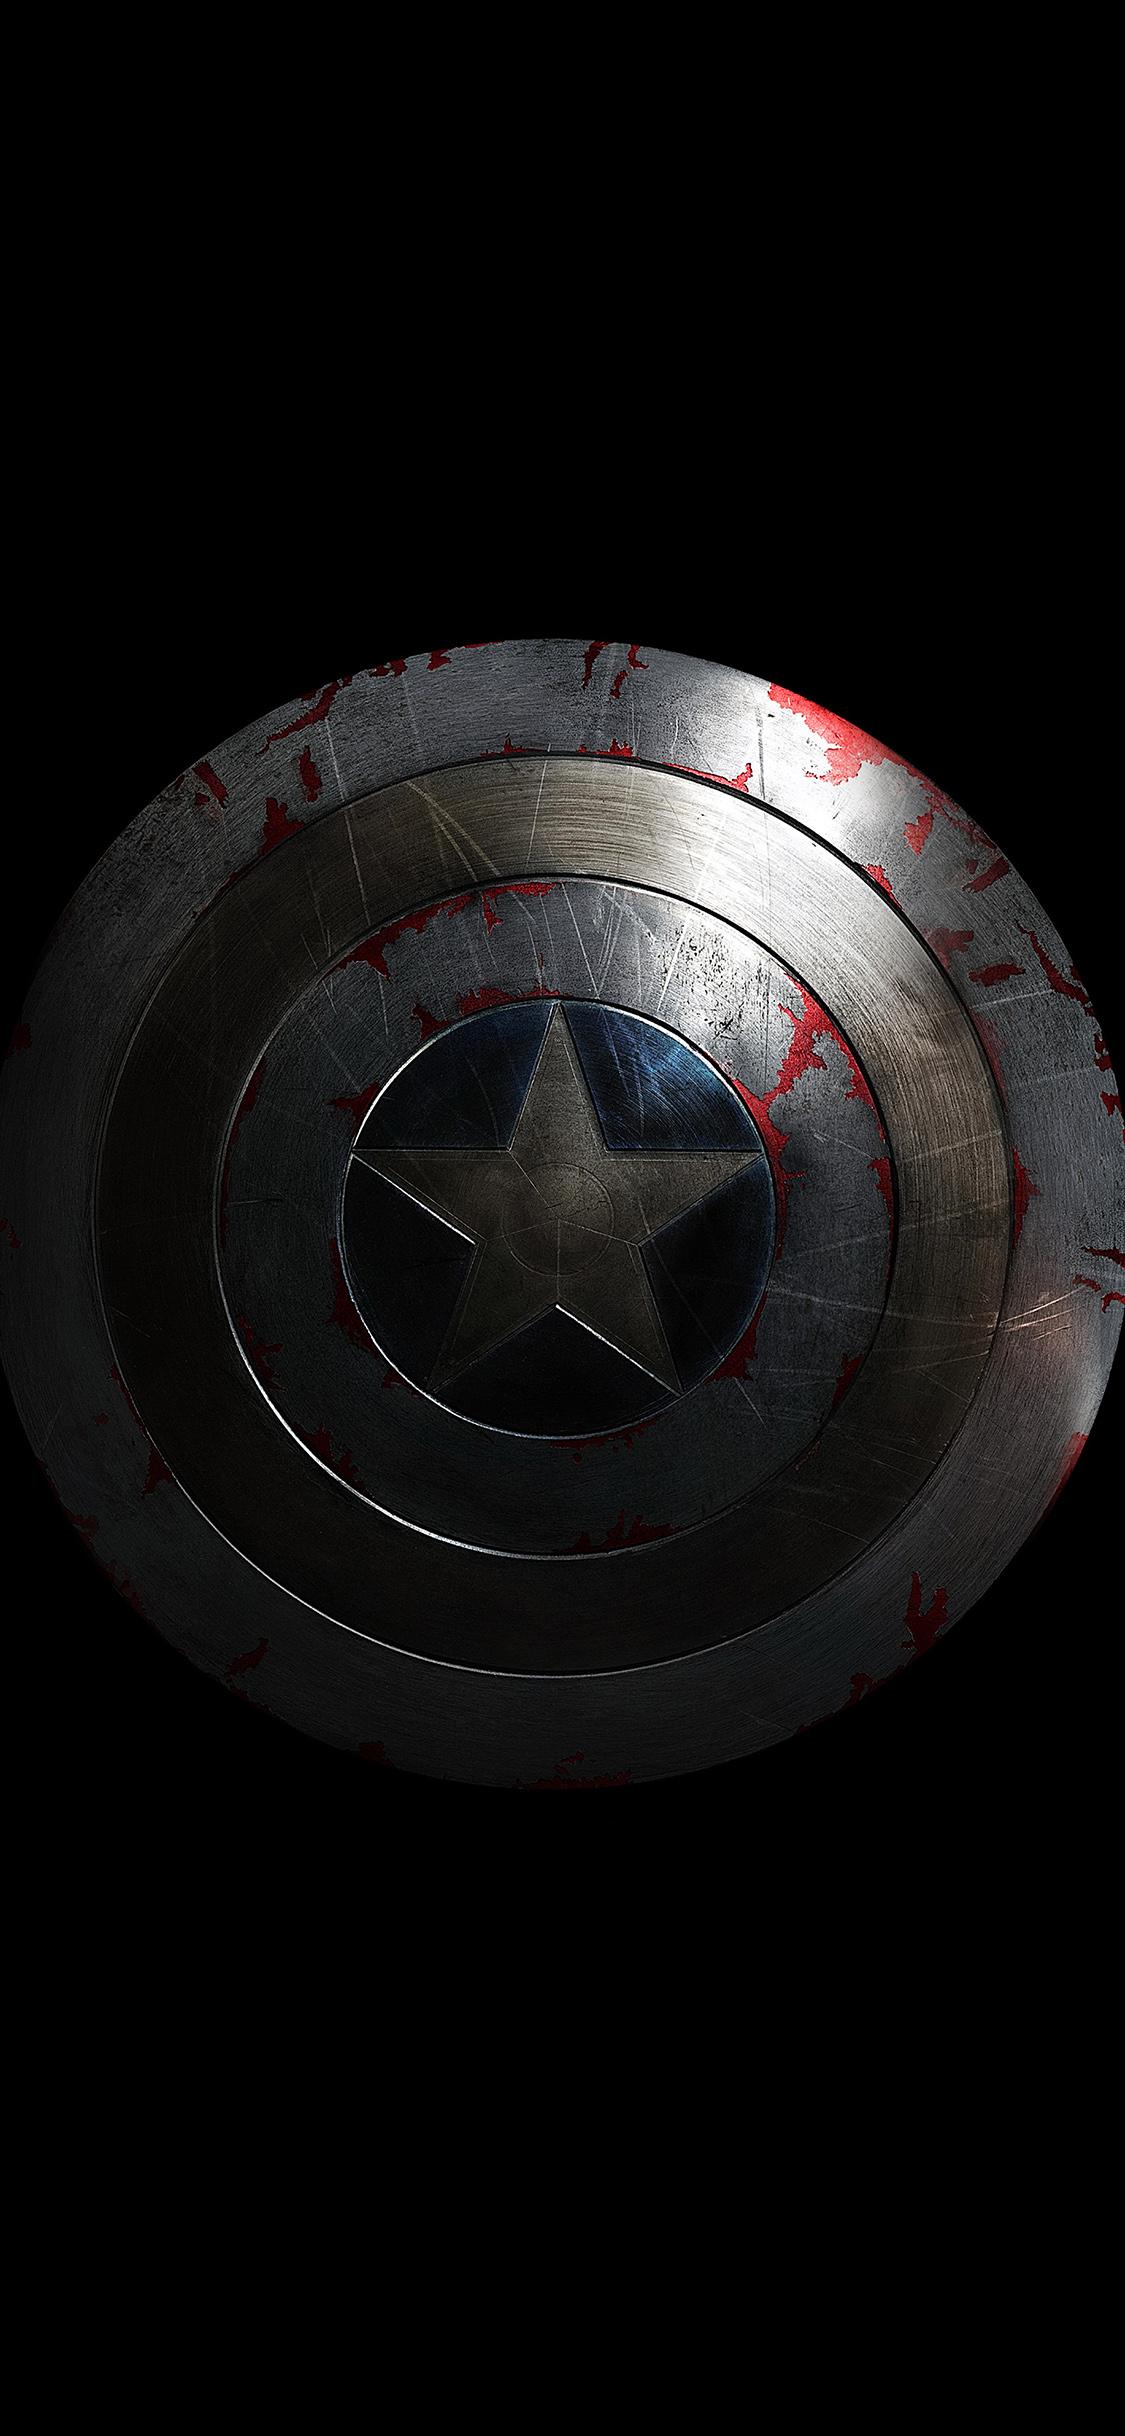 Com Apple Iphone Wallpaper Al85 Captain America Avengers - Avengers Iphone X Wallpaper Hd - HD Wallpaper